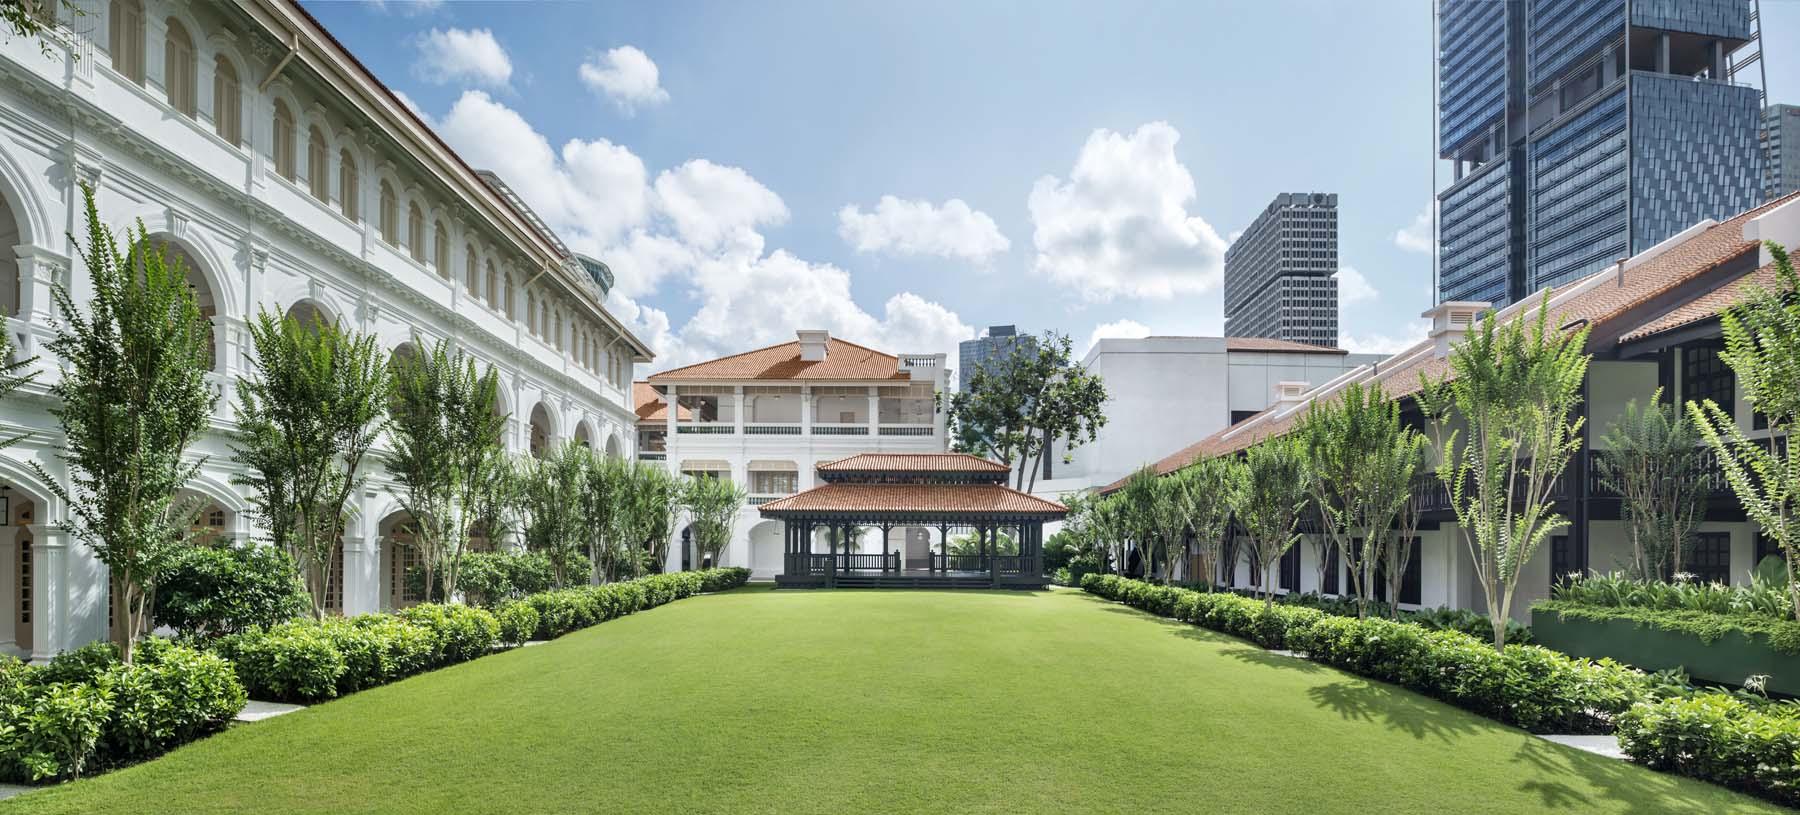 Raffles Singapore  - The Lawn